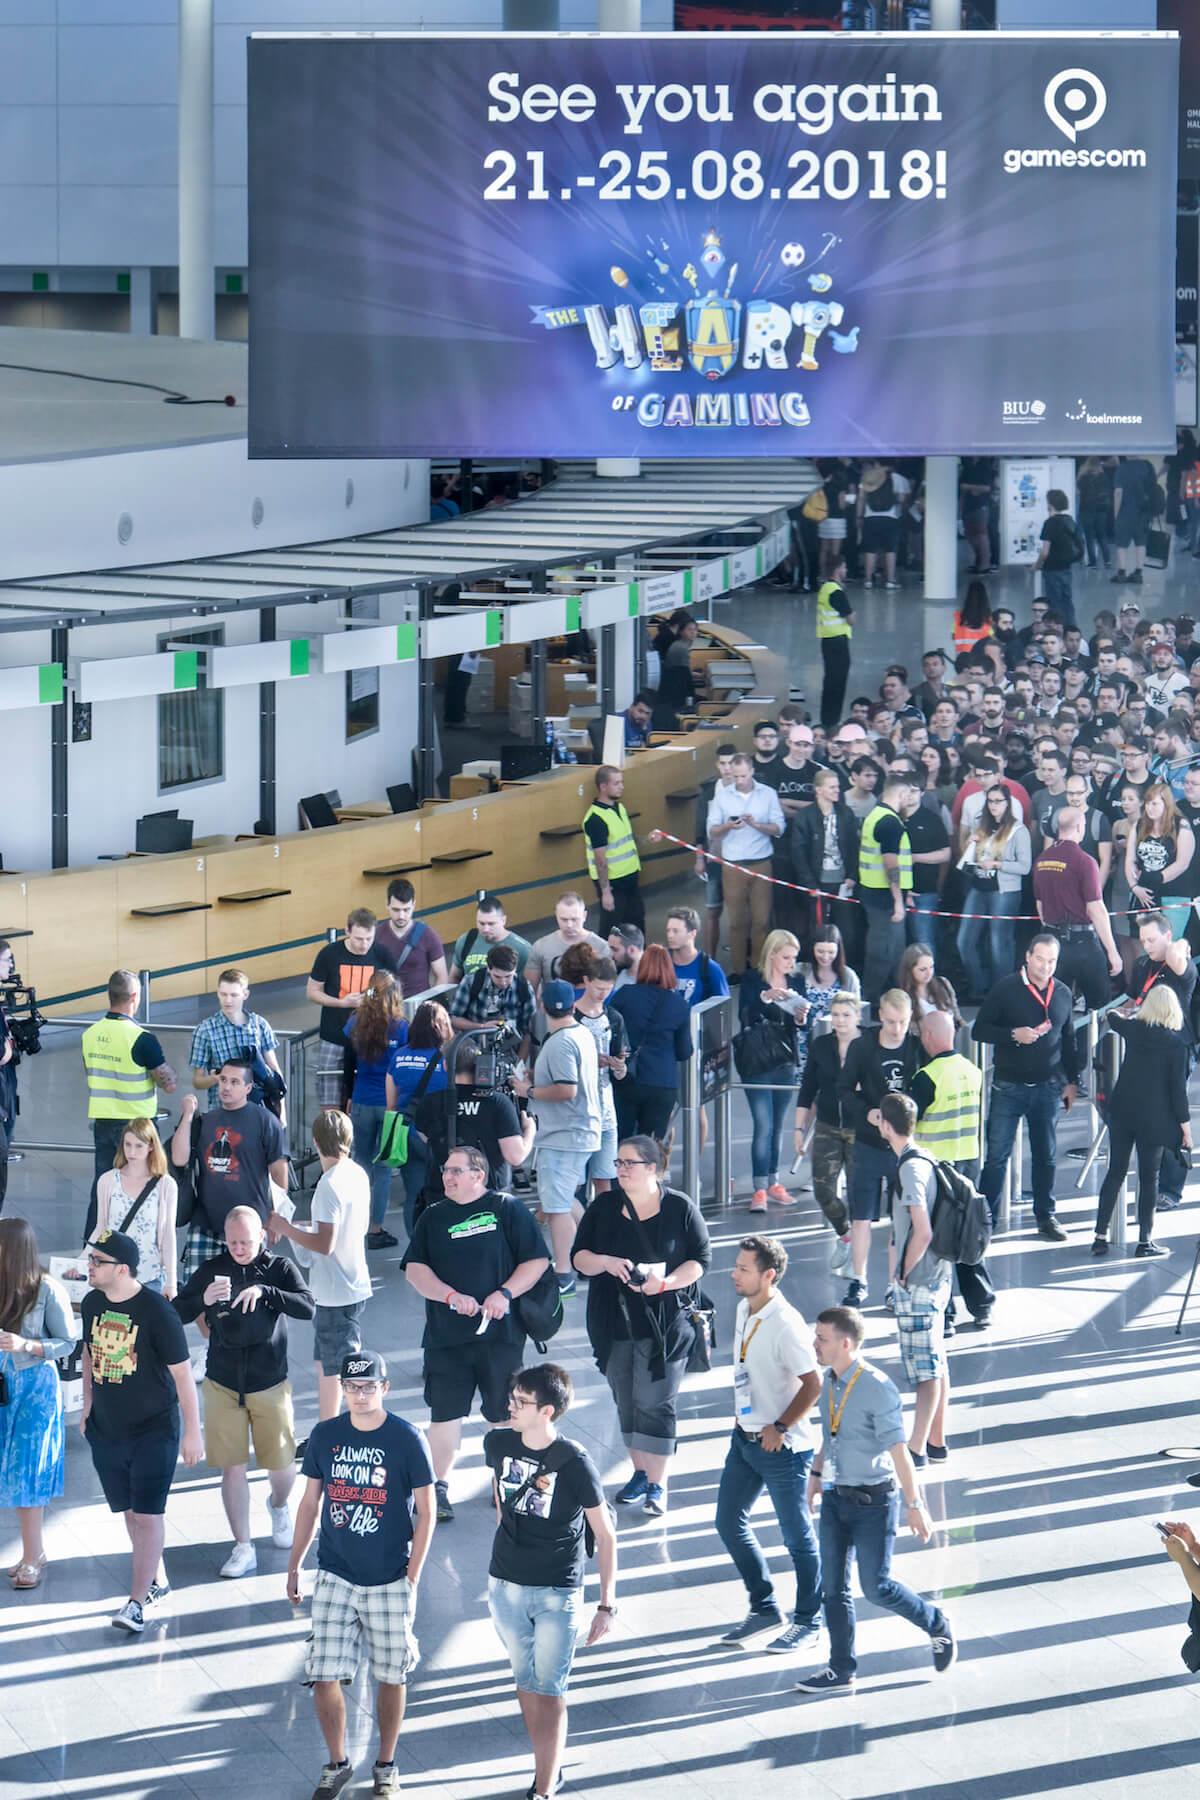 Gamescom 2017: Eingang Nord (Bildrechte: Koelnmesse GmbH, Thomas Klerx)